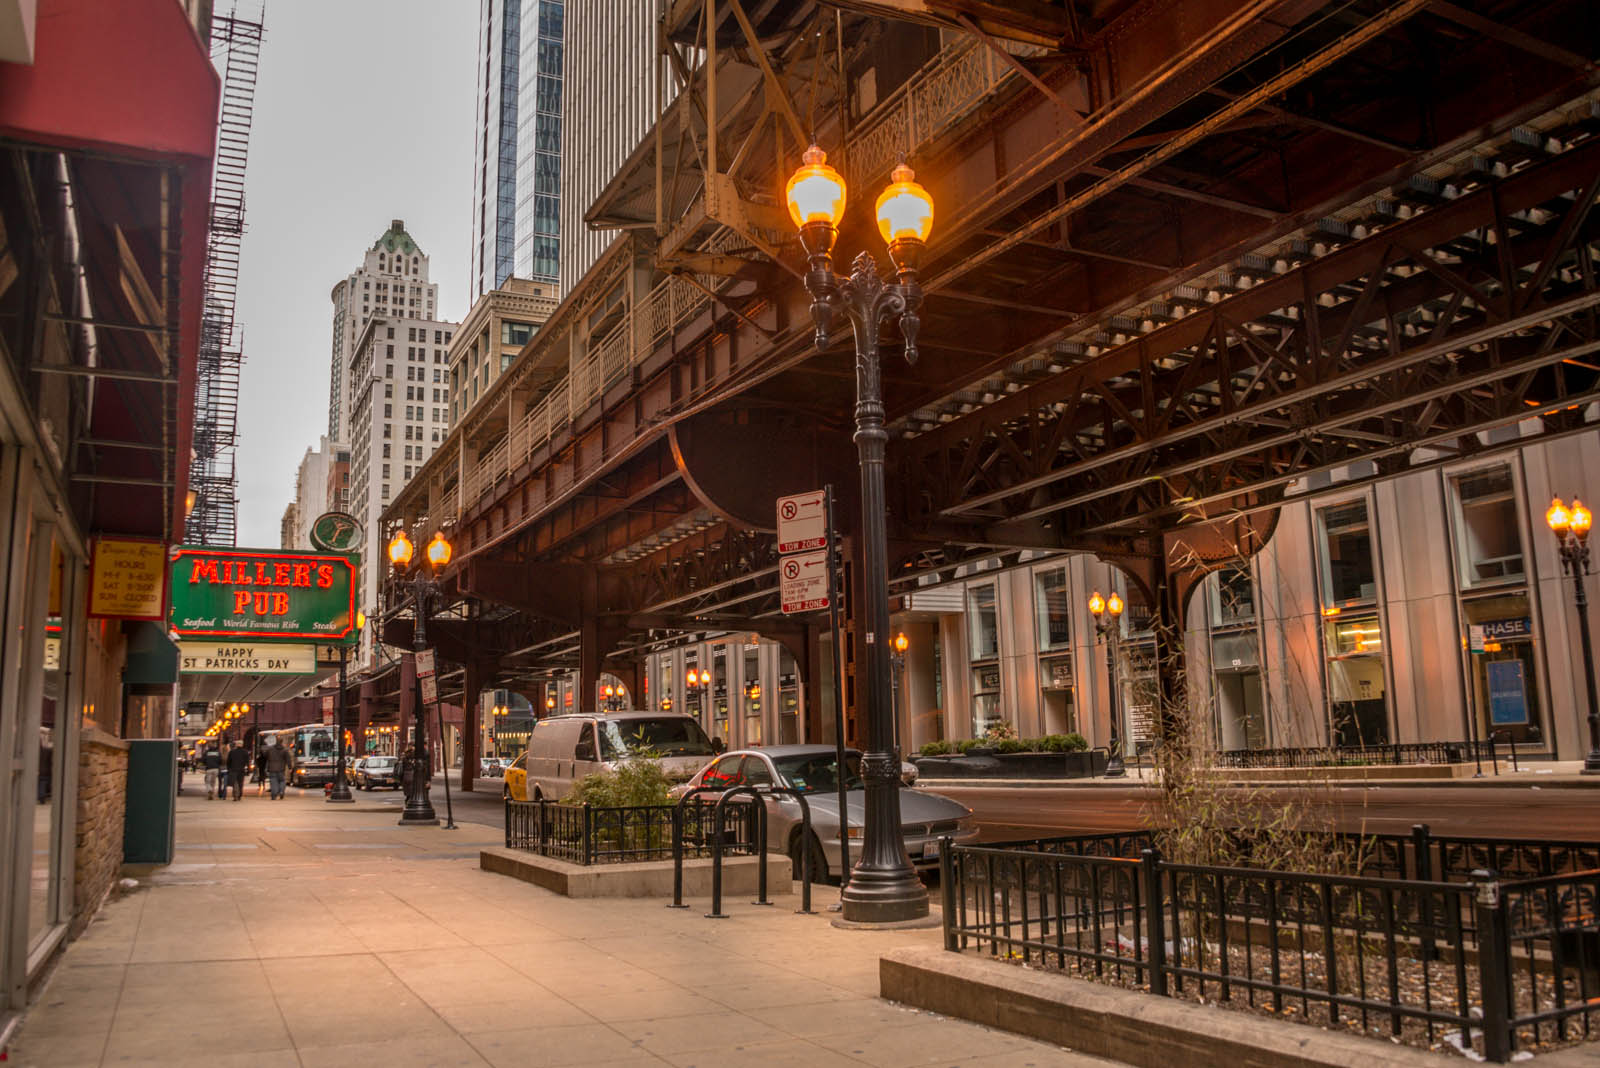 2013-03-17-Chicago-114